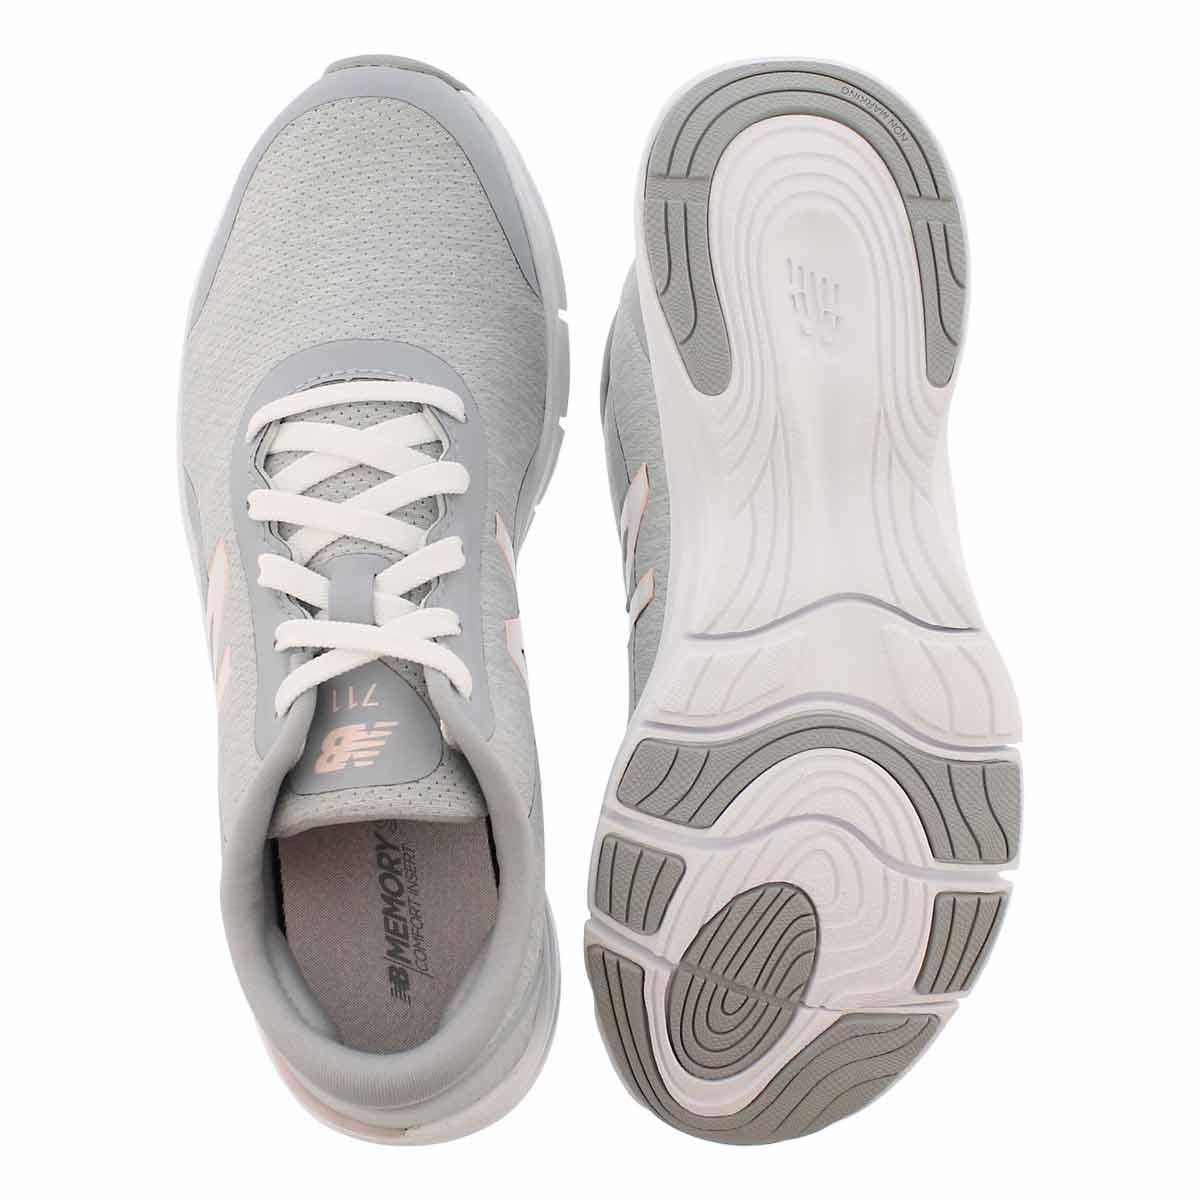 Lds 711v3 wht/sunrise lace up sneaker